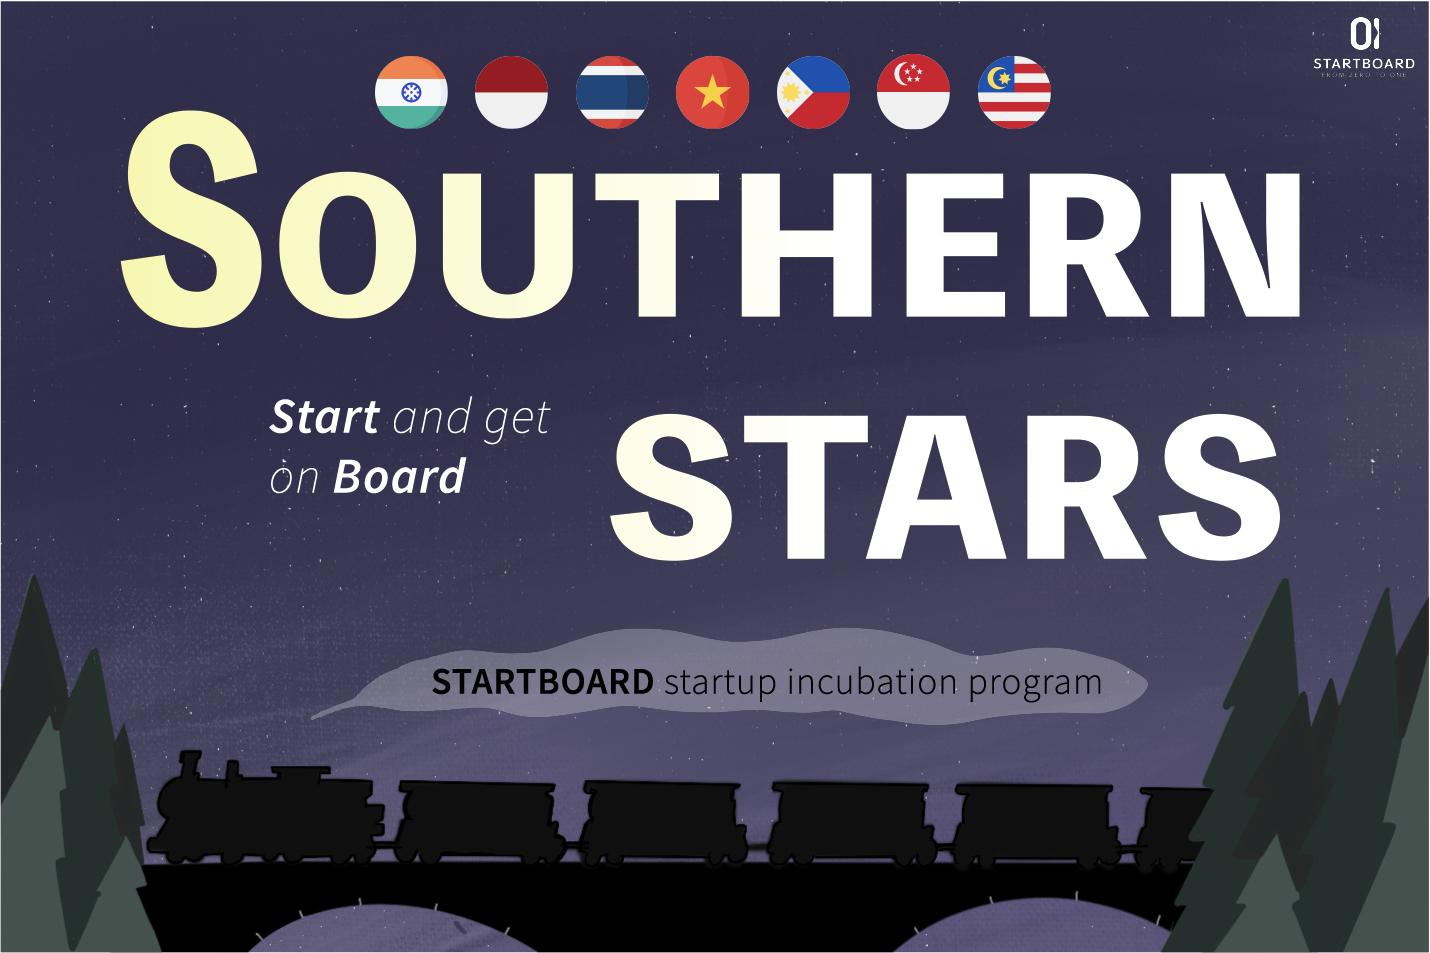 Southern Stars Startboard Incubation Program Recruiting Now